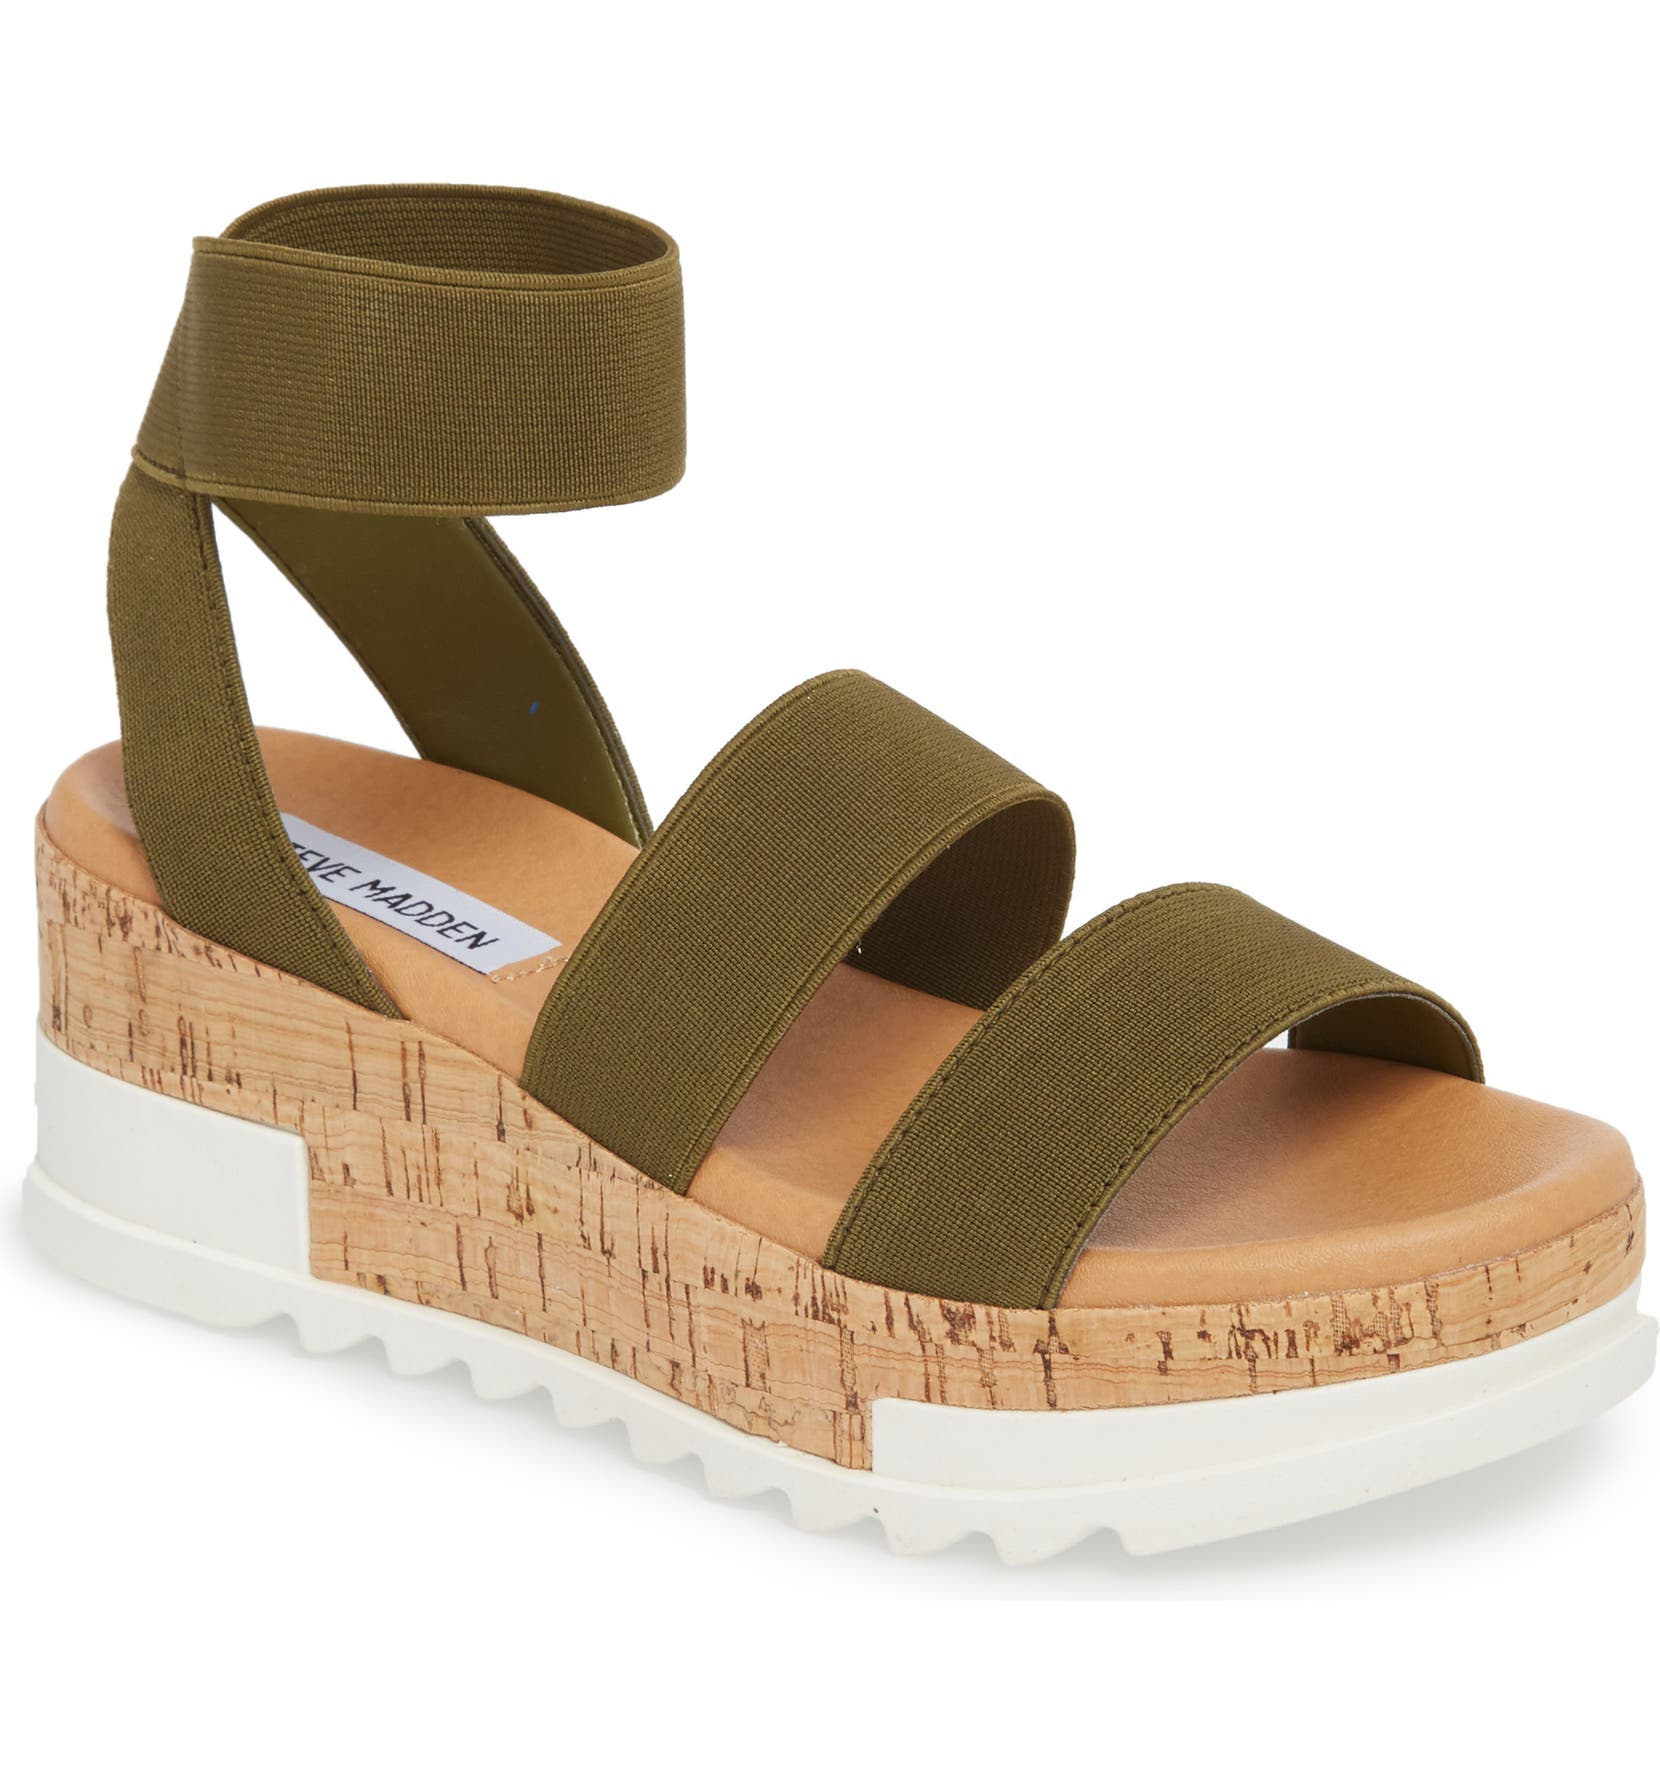 8ef84cb6224 Bandi Platform Wedge Sandal